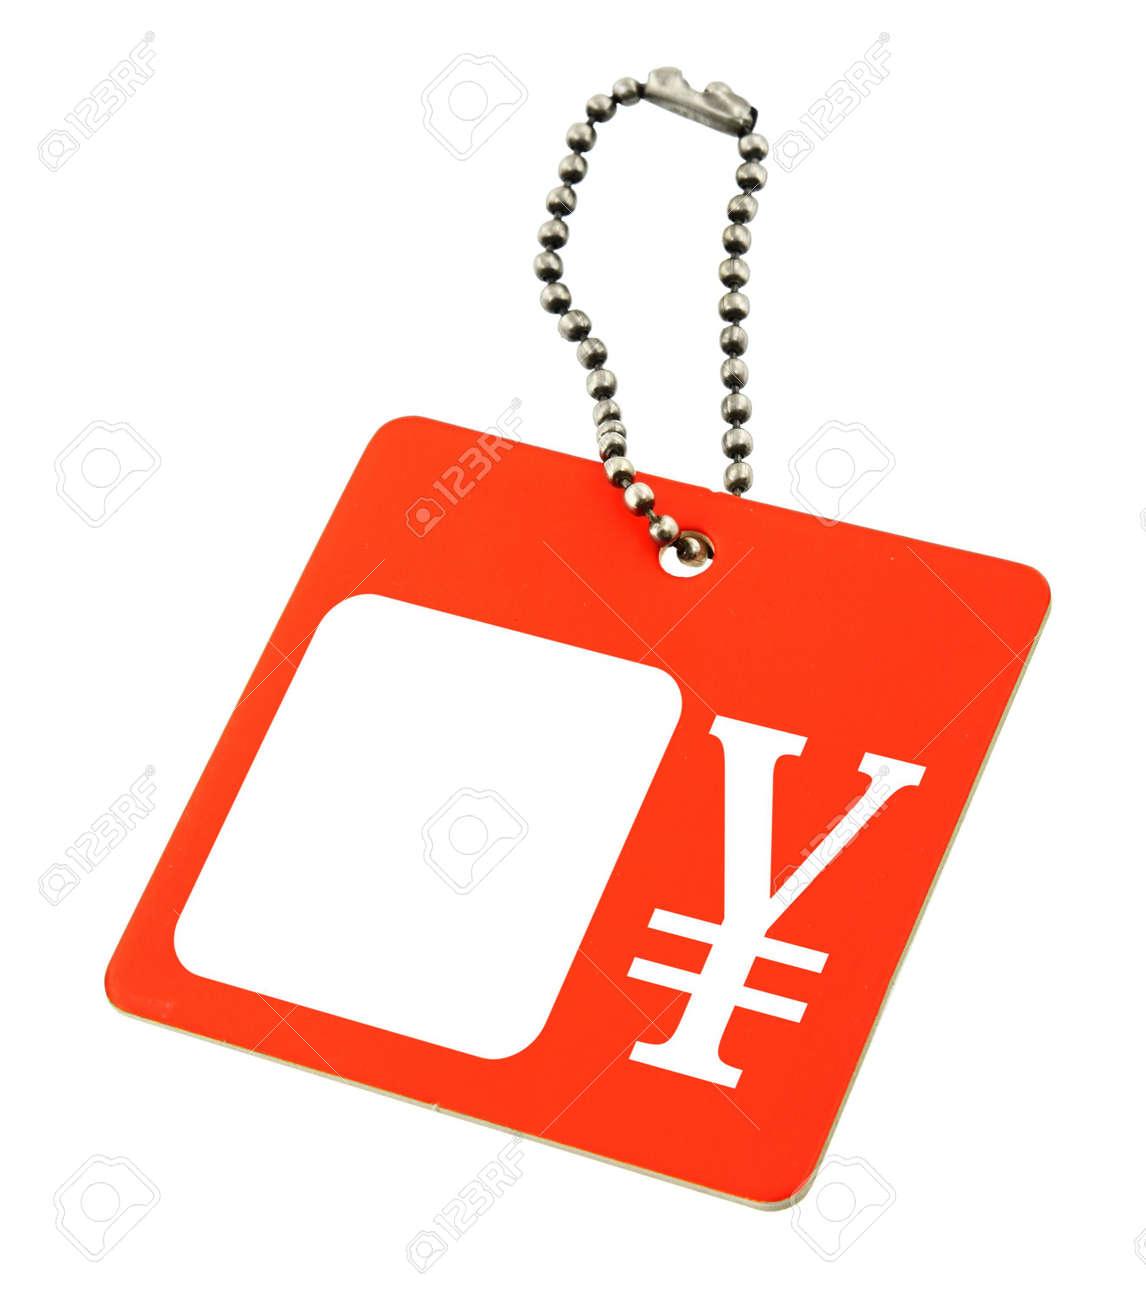 Price tag with japanese yen symbol copy space for price no price tag with japanese yen symbol copy space for price no copyright infringement stock biocorpaavc Choice Image